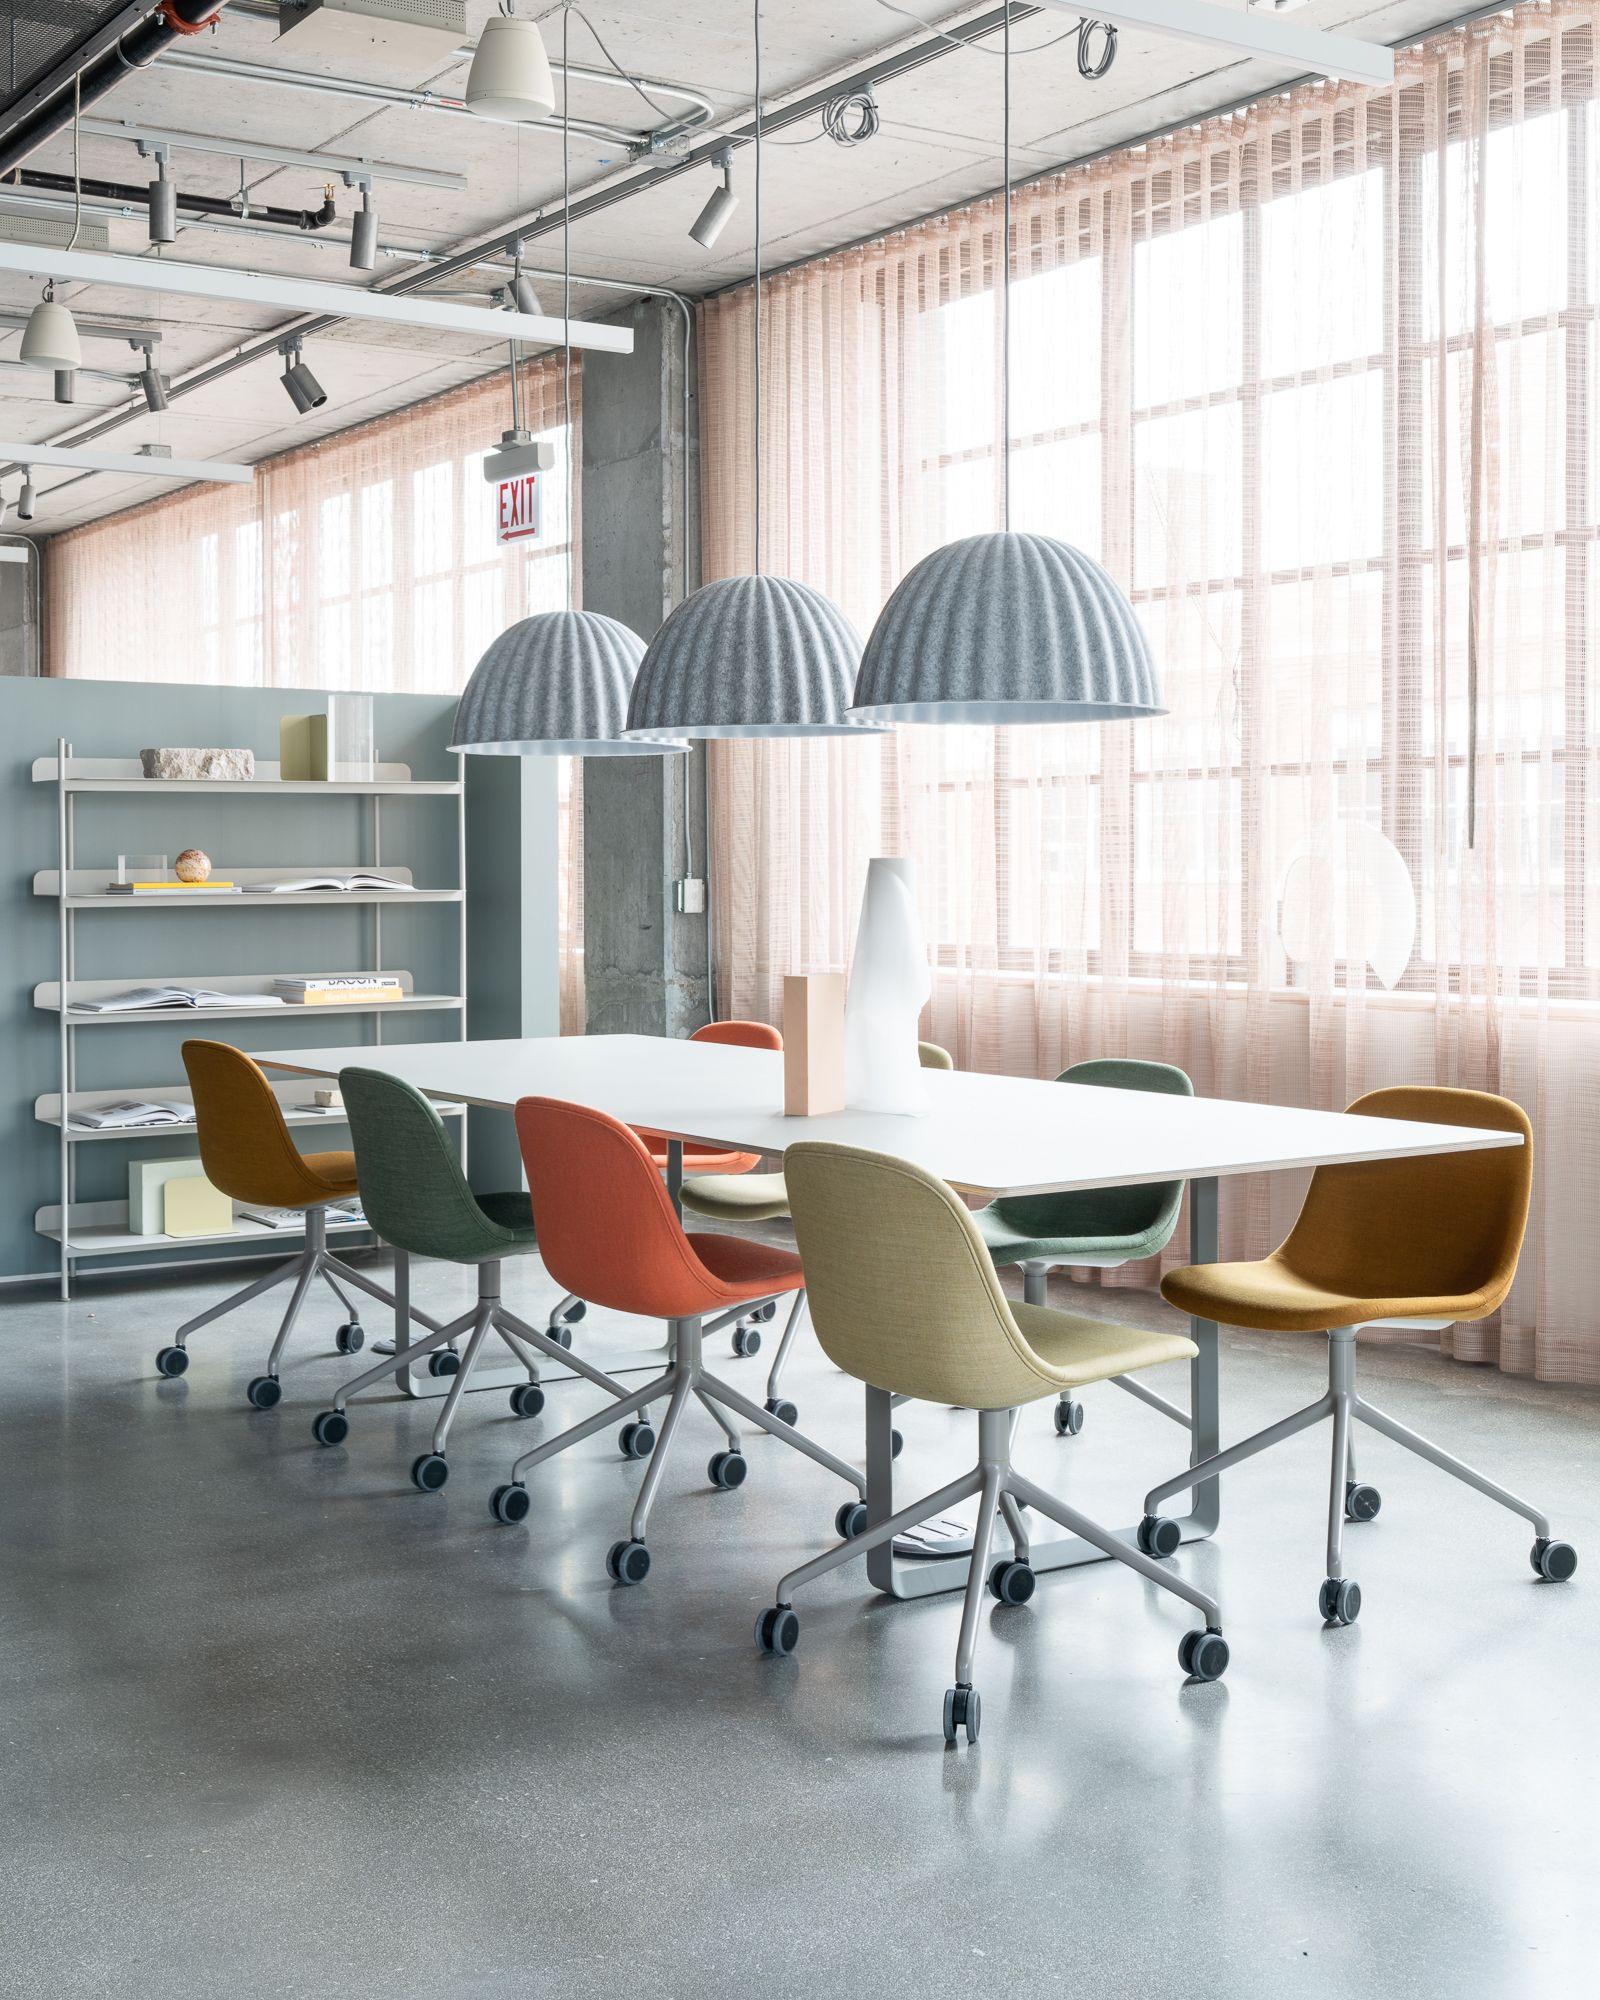 Modern Scandinavian Office Chair Inspiration For Office Space Interior From Muuto The Fiber A Modern Office Interiors Modern Office Space Modern Office Design